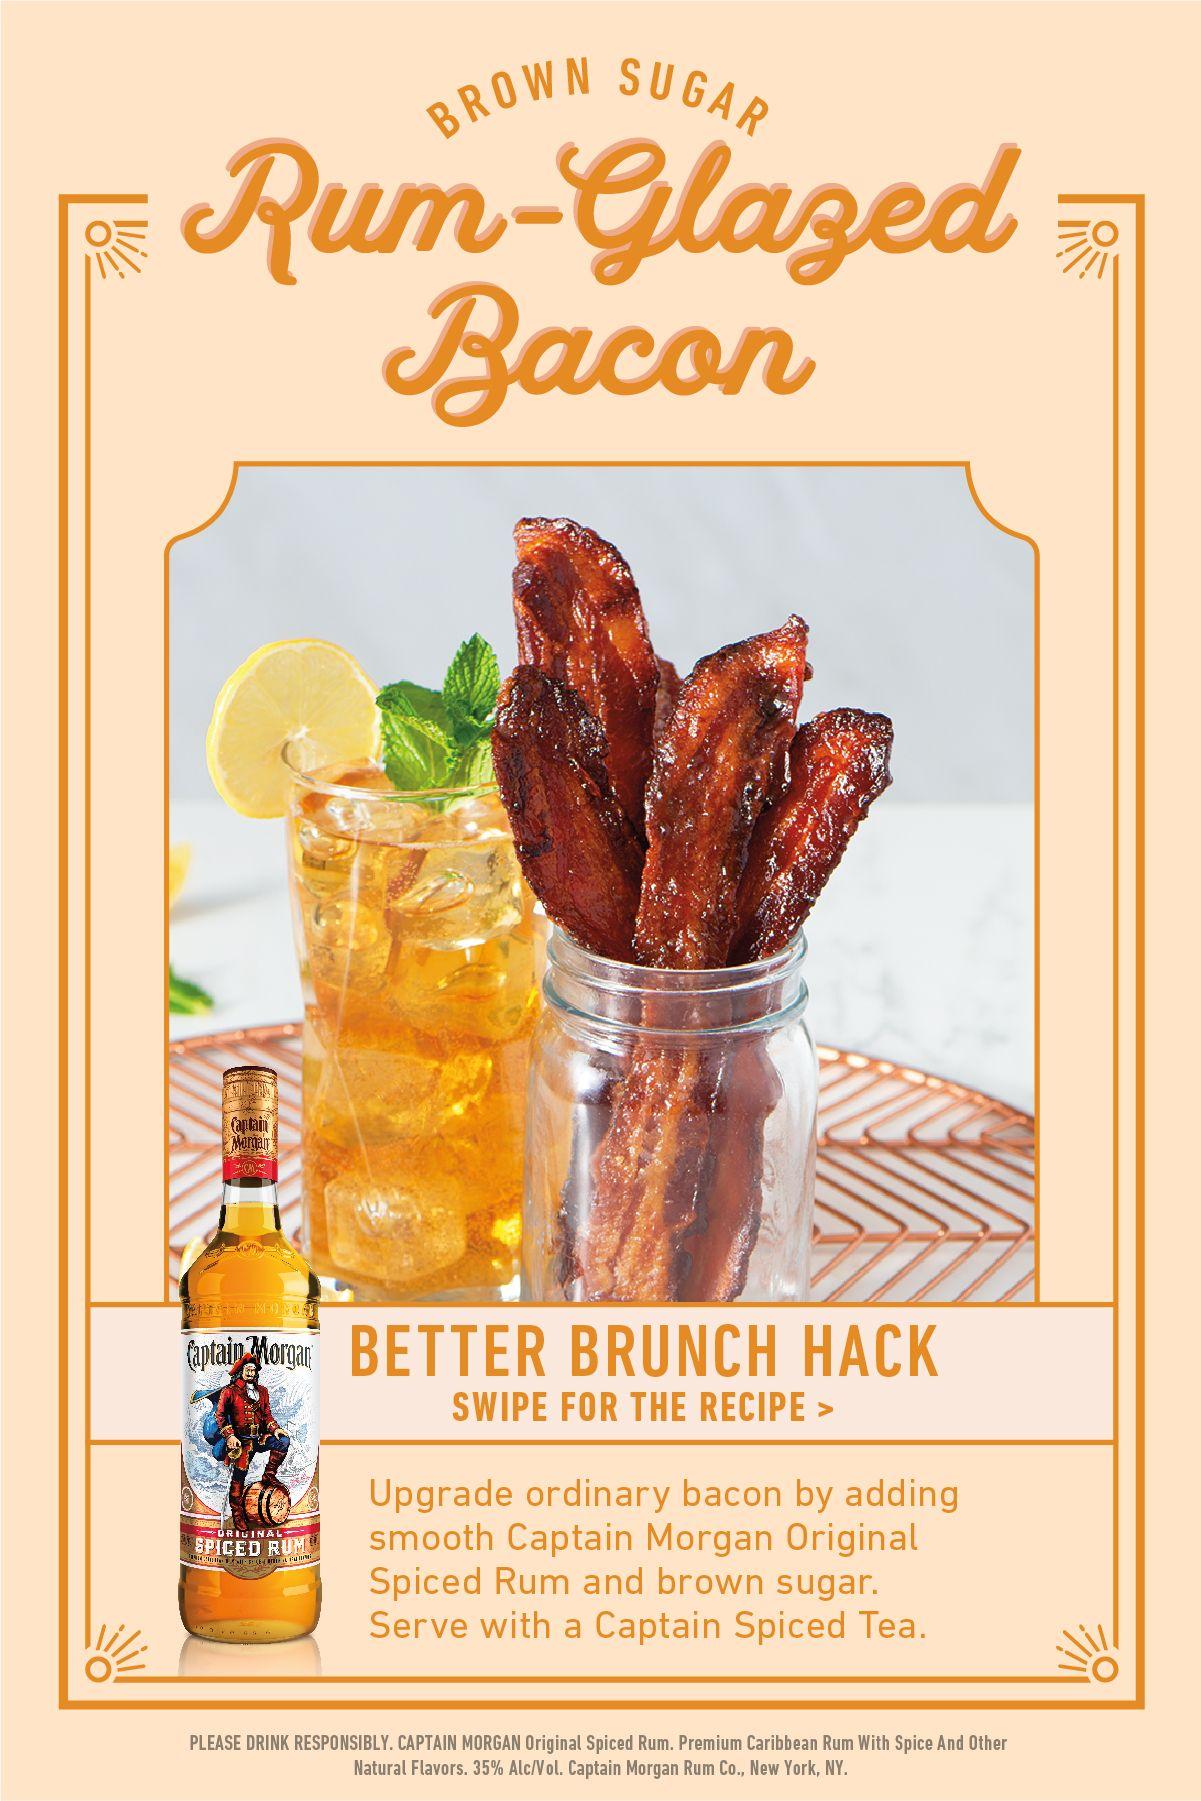 Captain Morgan Rum-Glazed Bacon Recipe